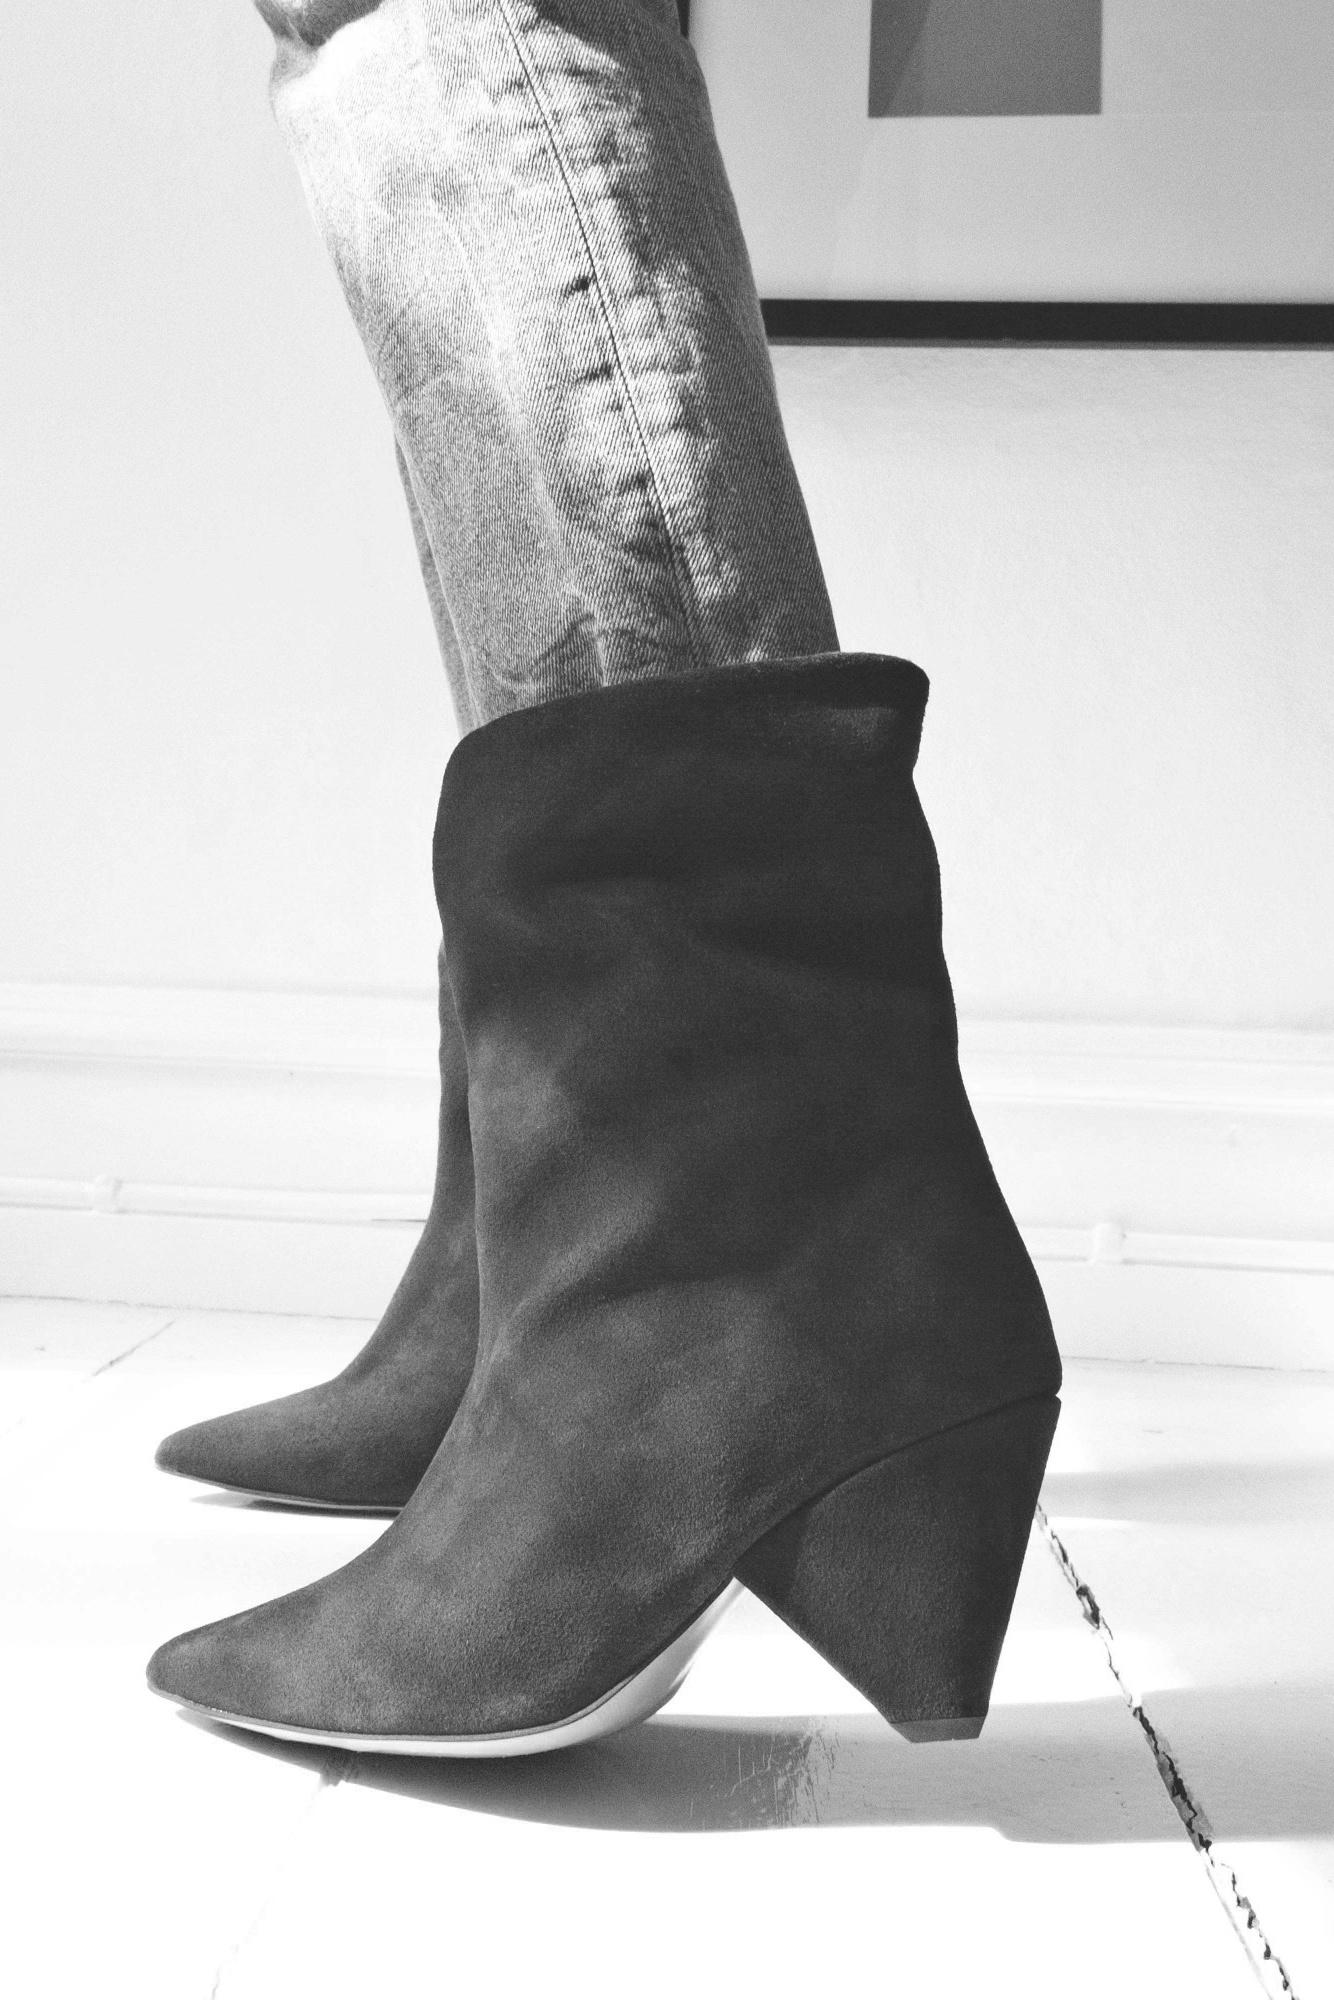 Vully 75 Triangle Calf Suede Boot - Dark Grey 38-2